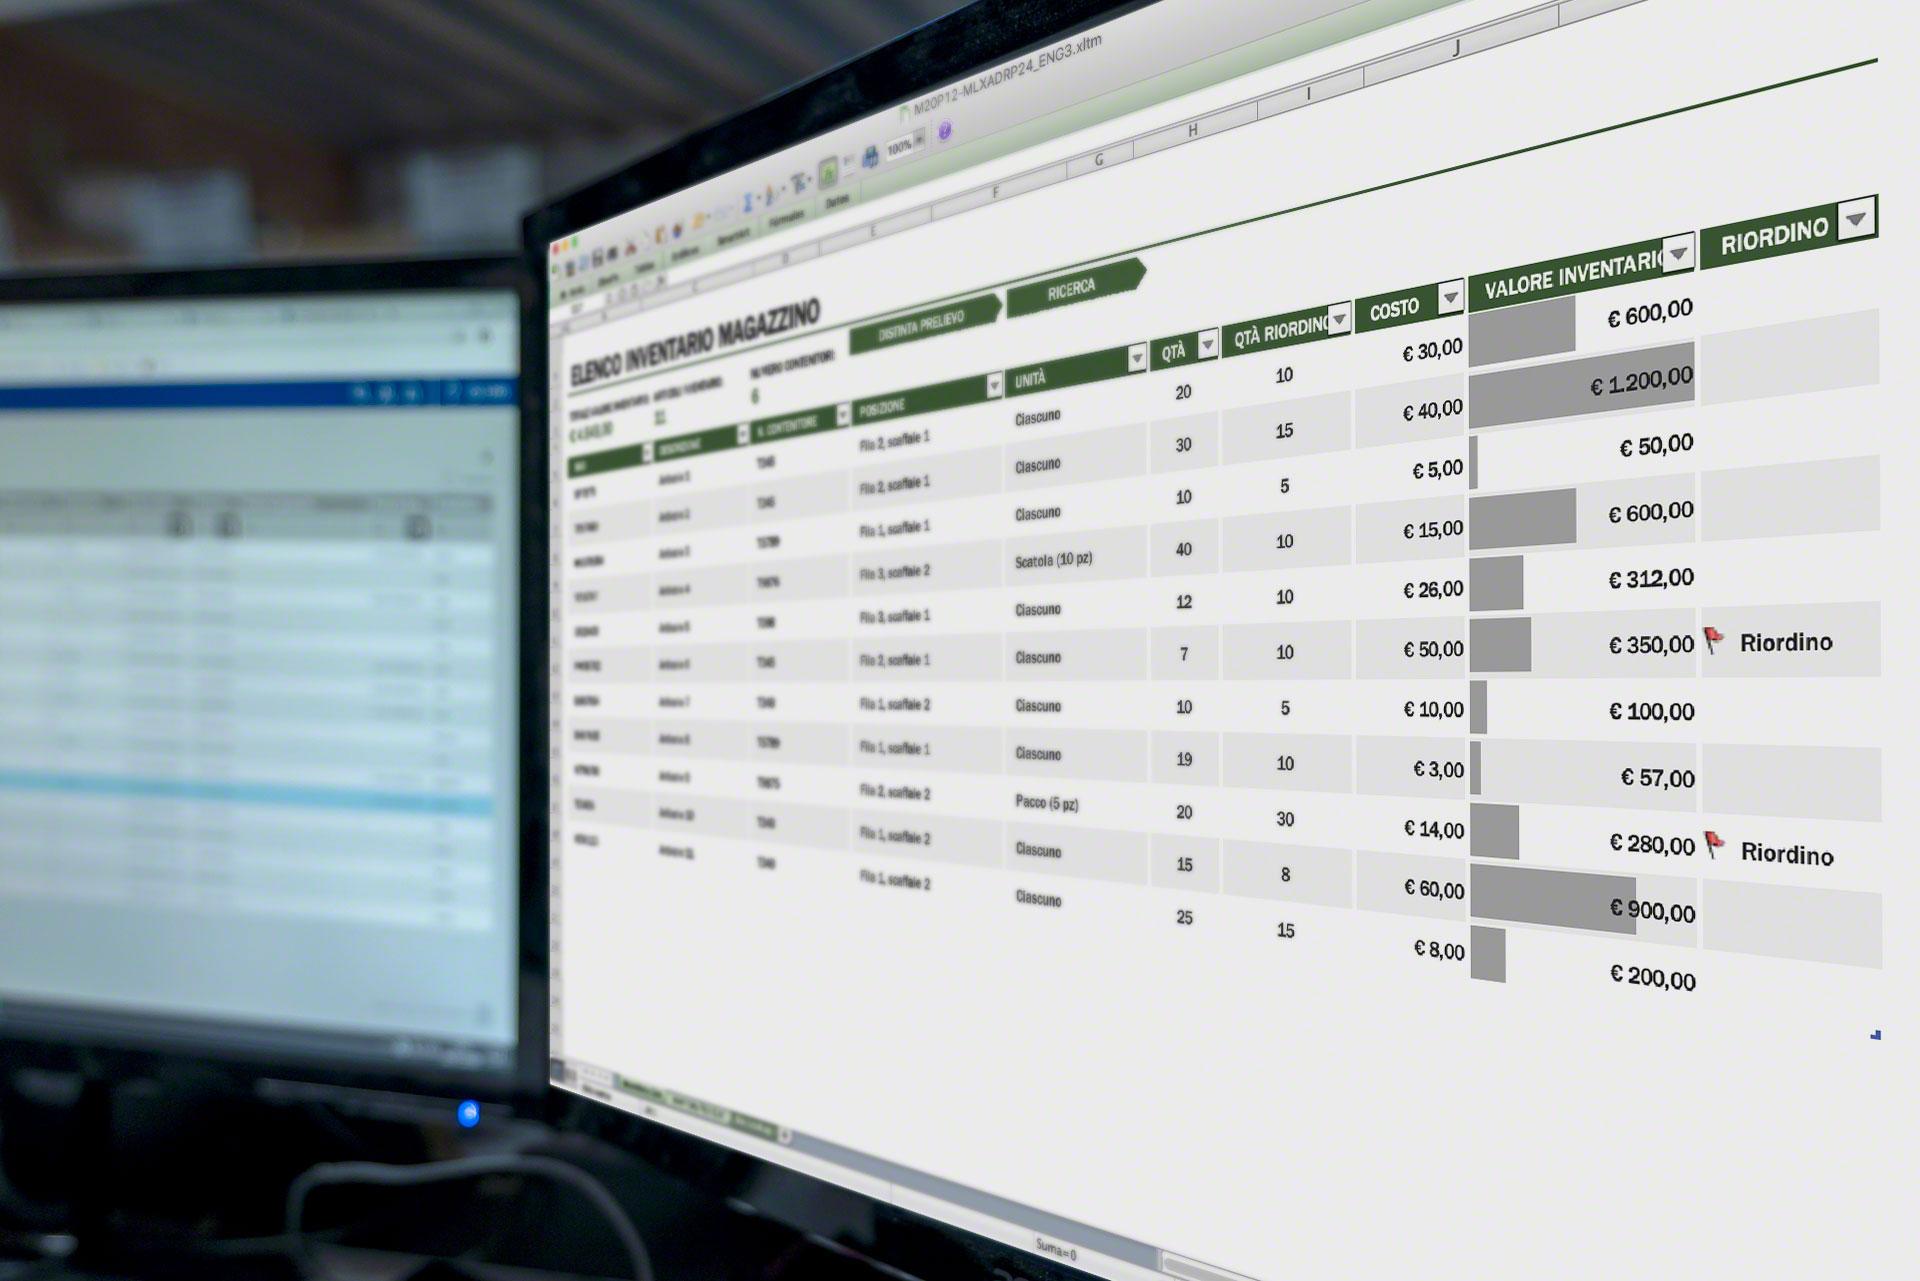 Excel per inventario magazzino: soluzione efficace o rischio?